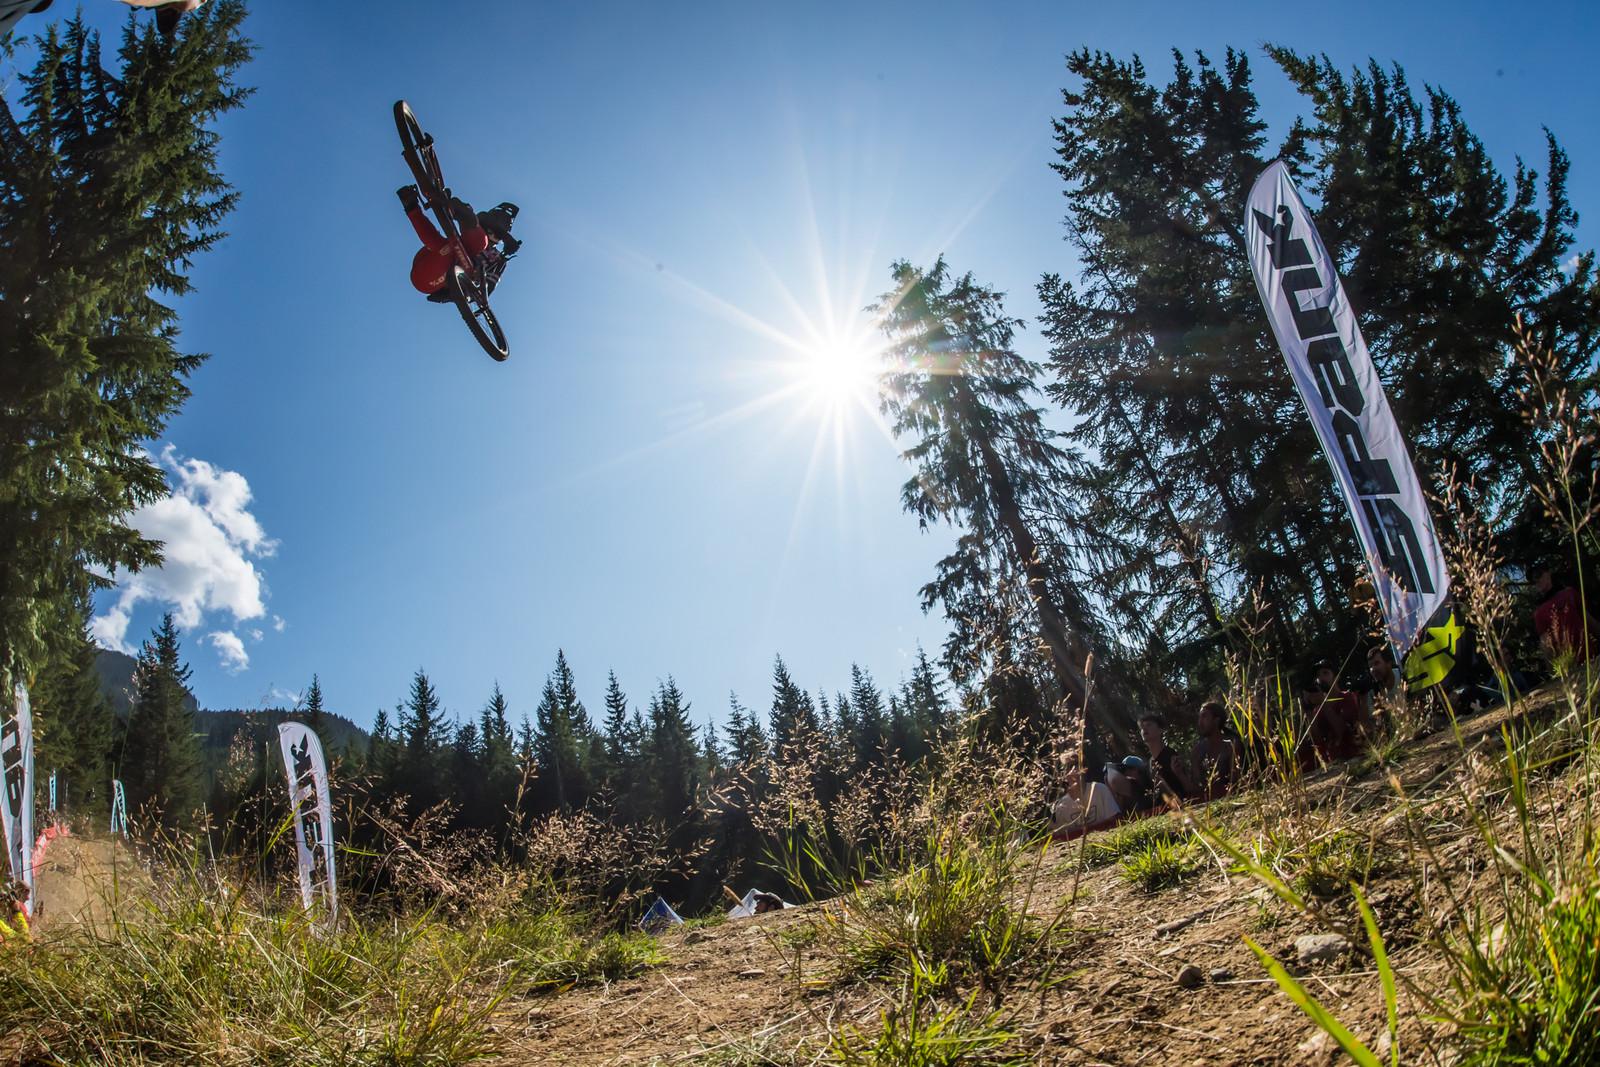 Kade Edwards - 2019 Whip-Off World Champs Crankworx Whistler - Mountain Biking Pictures - Vital MTB